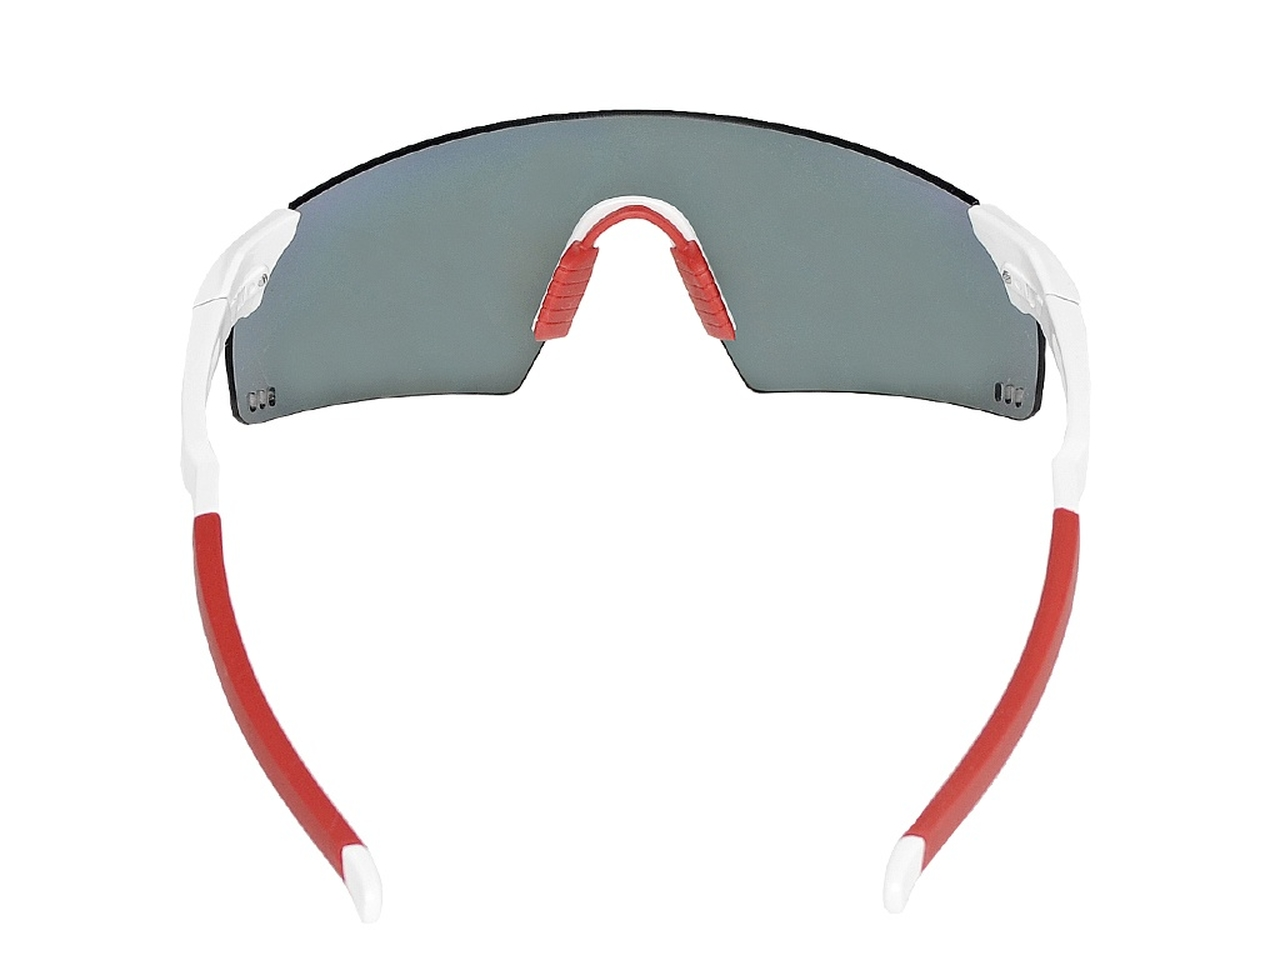 OCULOS HB QUAD R PEARLED WHITE RED CHROME (10100230407027)